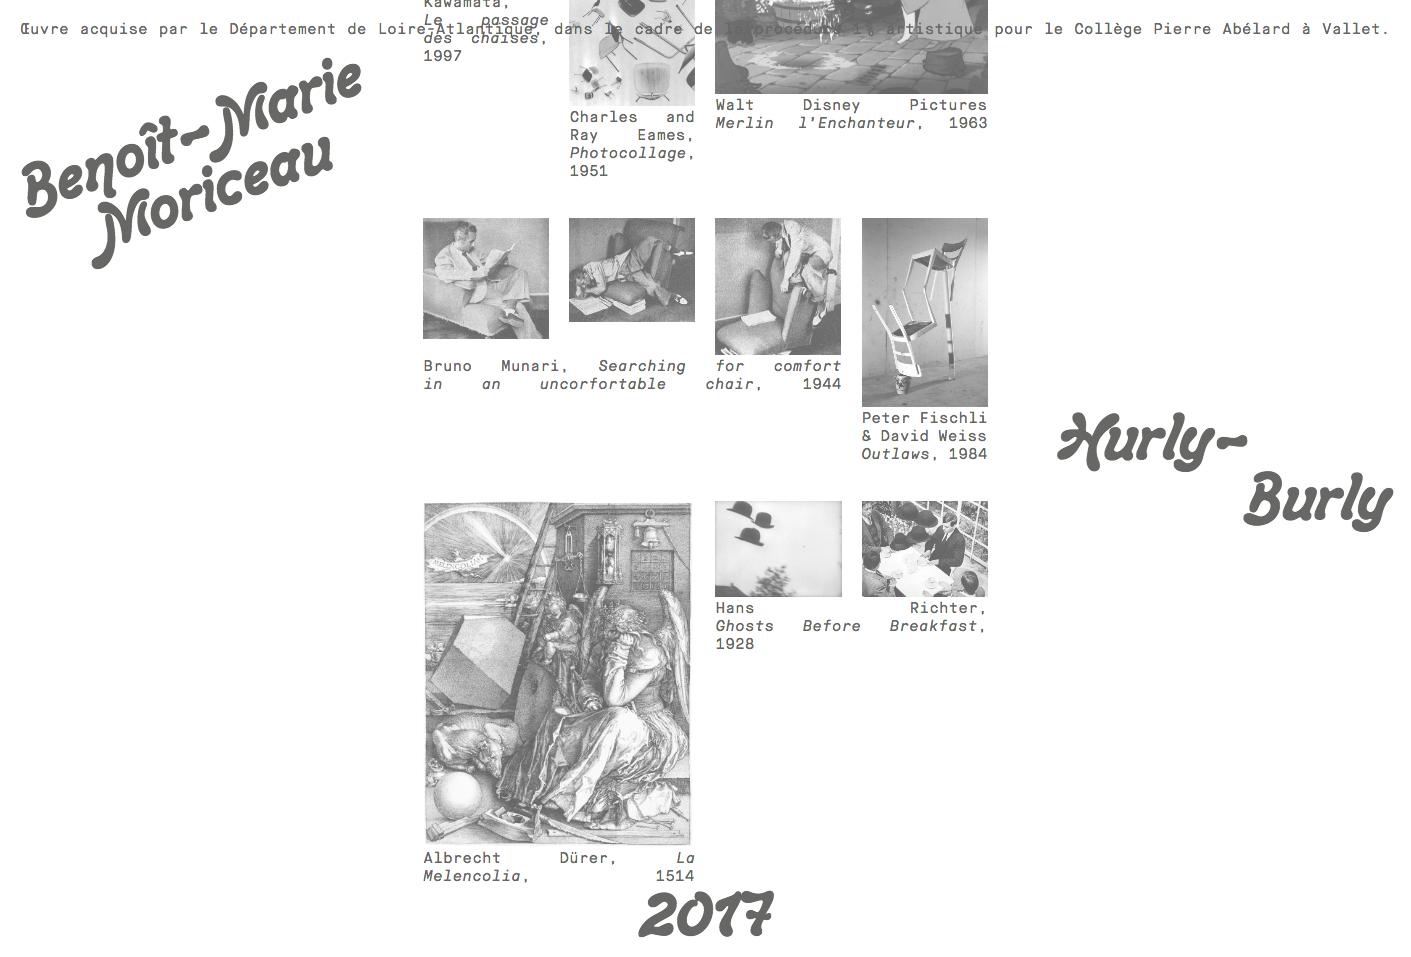 Hurly-Burly's website — Lisa Sturacci Graphiste